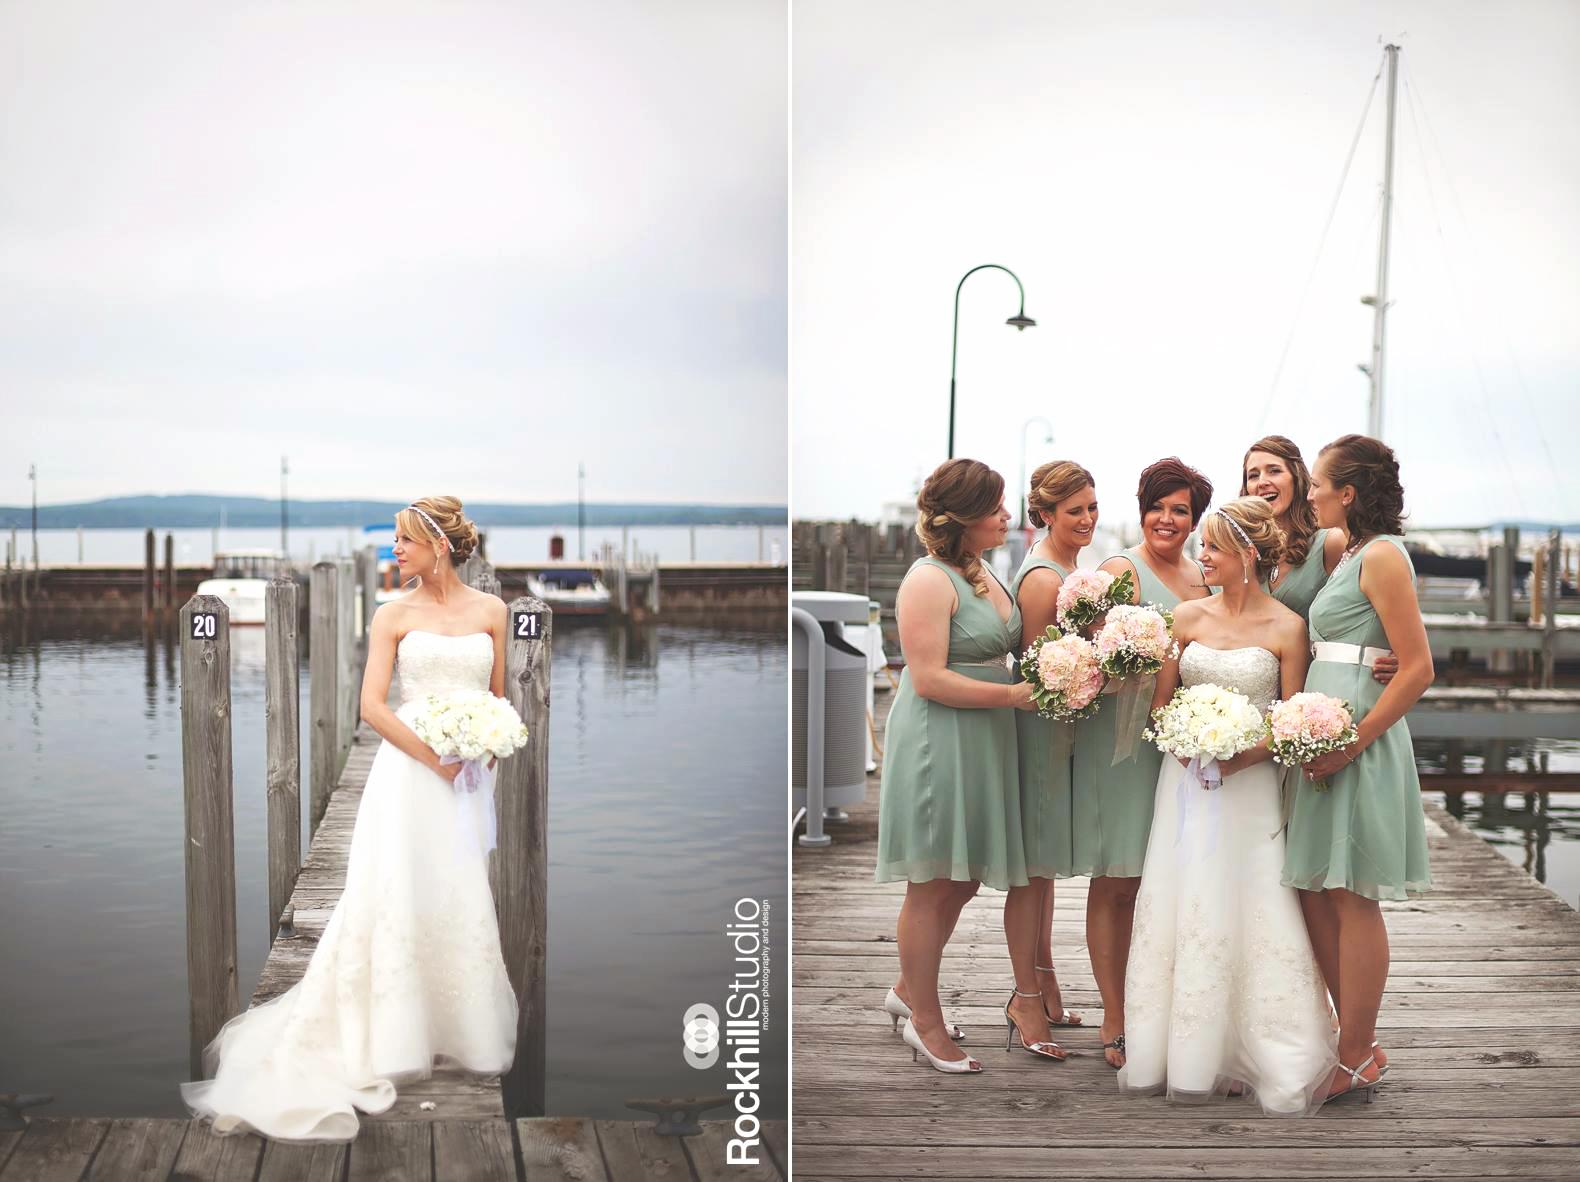 petoskey-wedding-photography-rockhill-studio-michigan-7.jpg